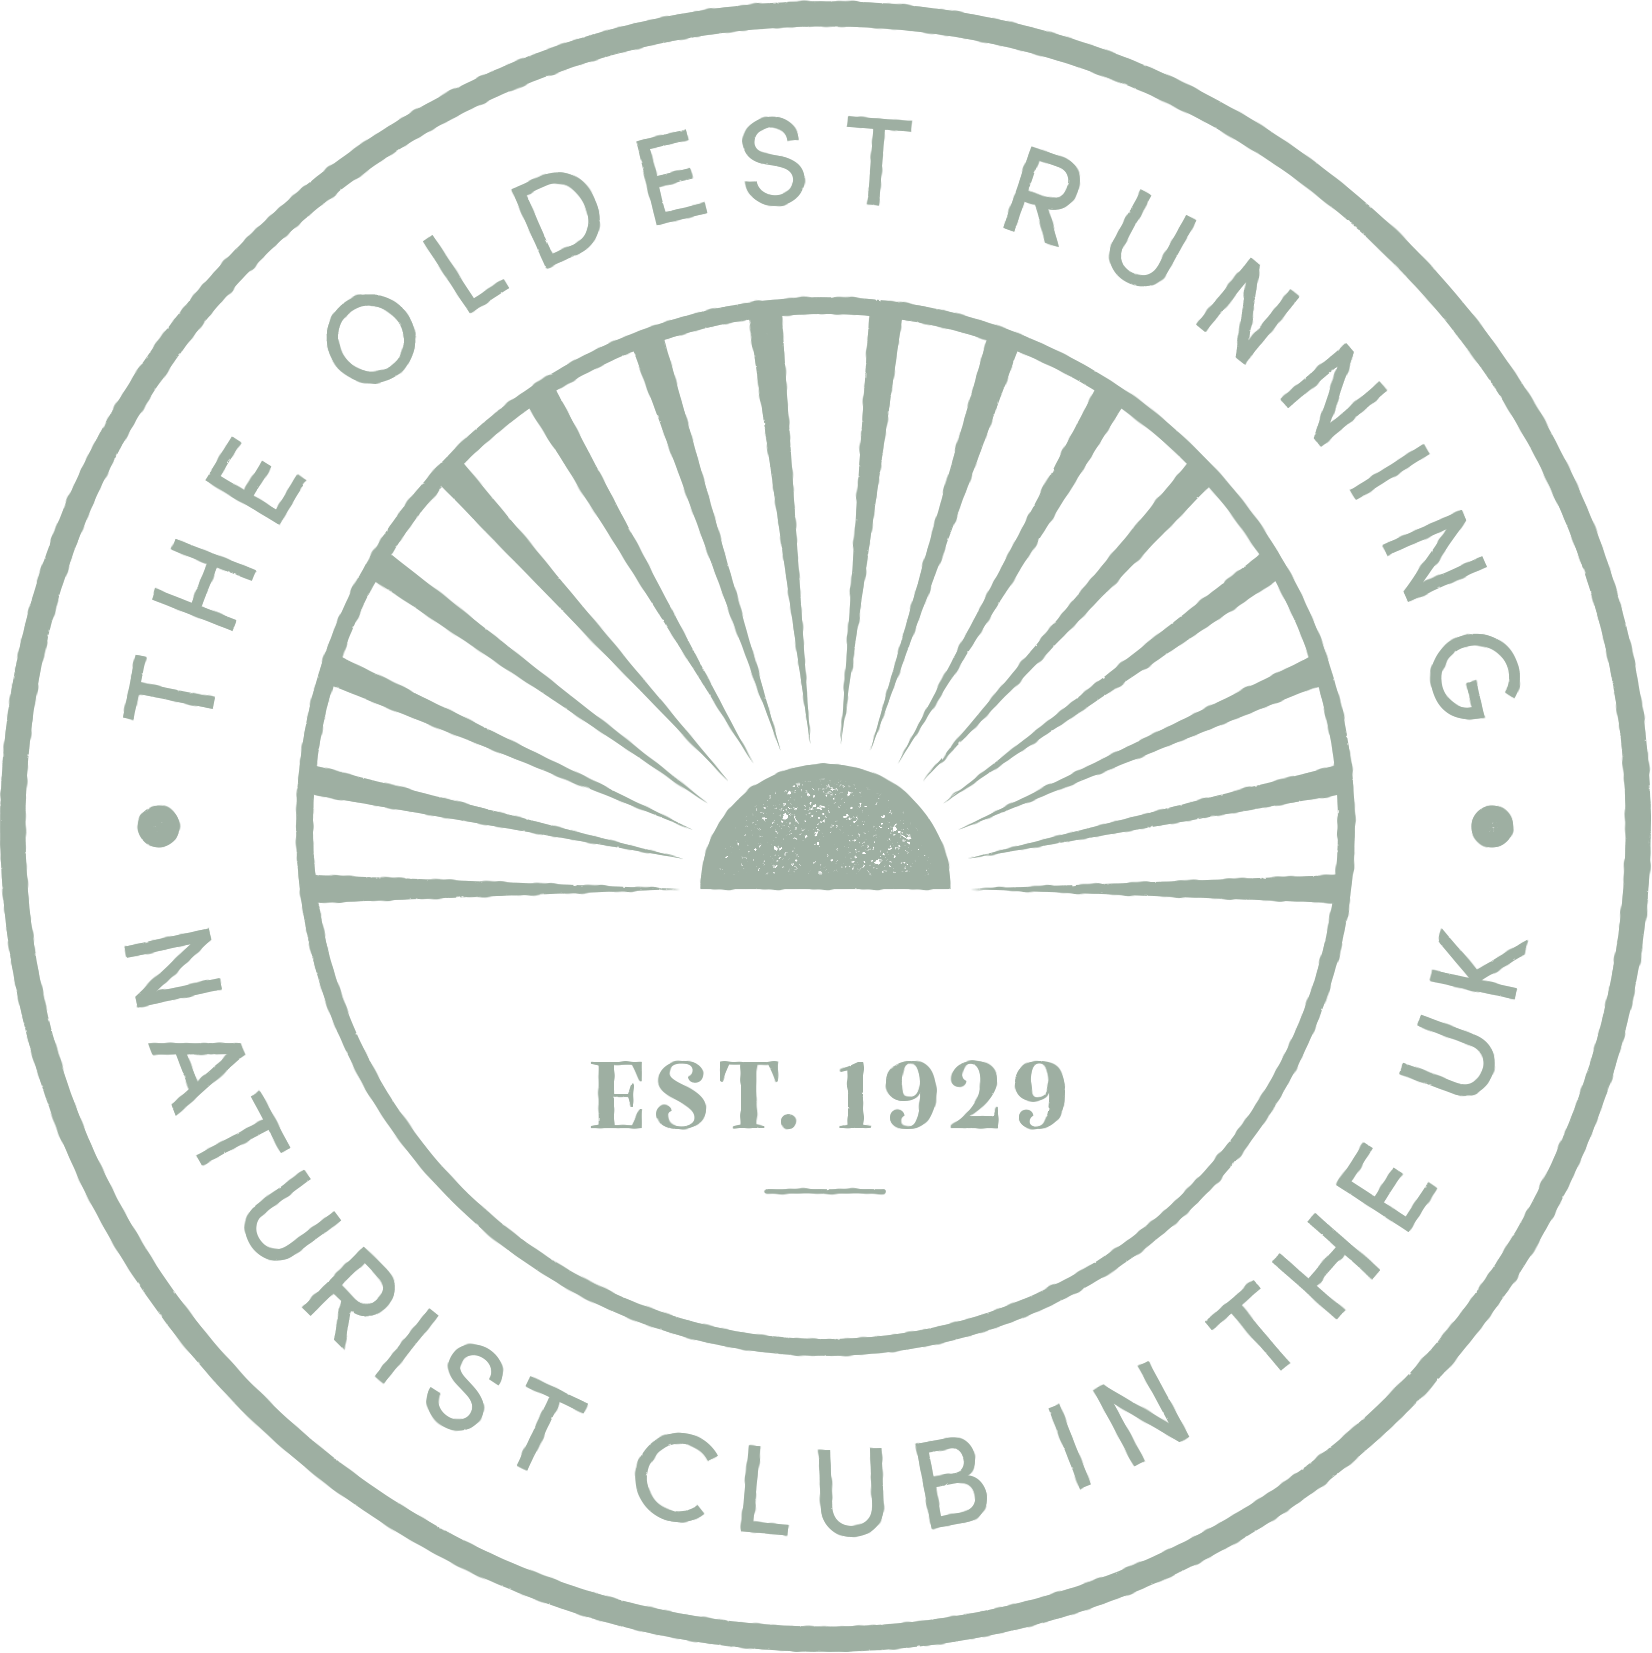 Longest running naturist club in the UK